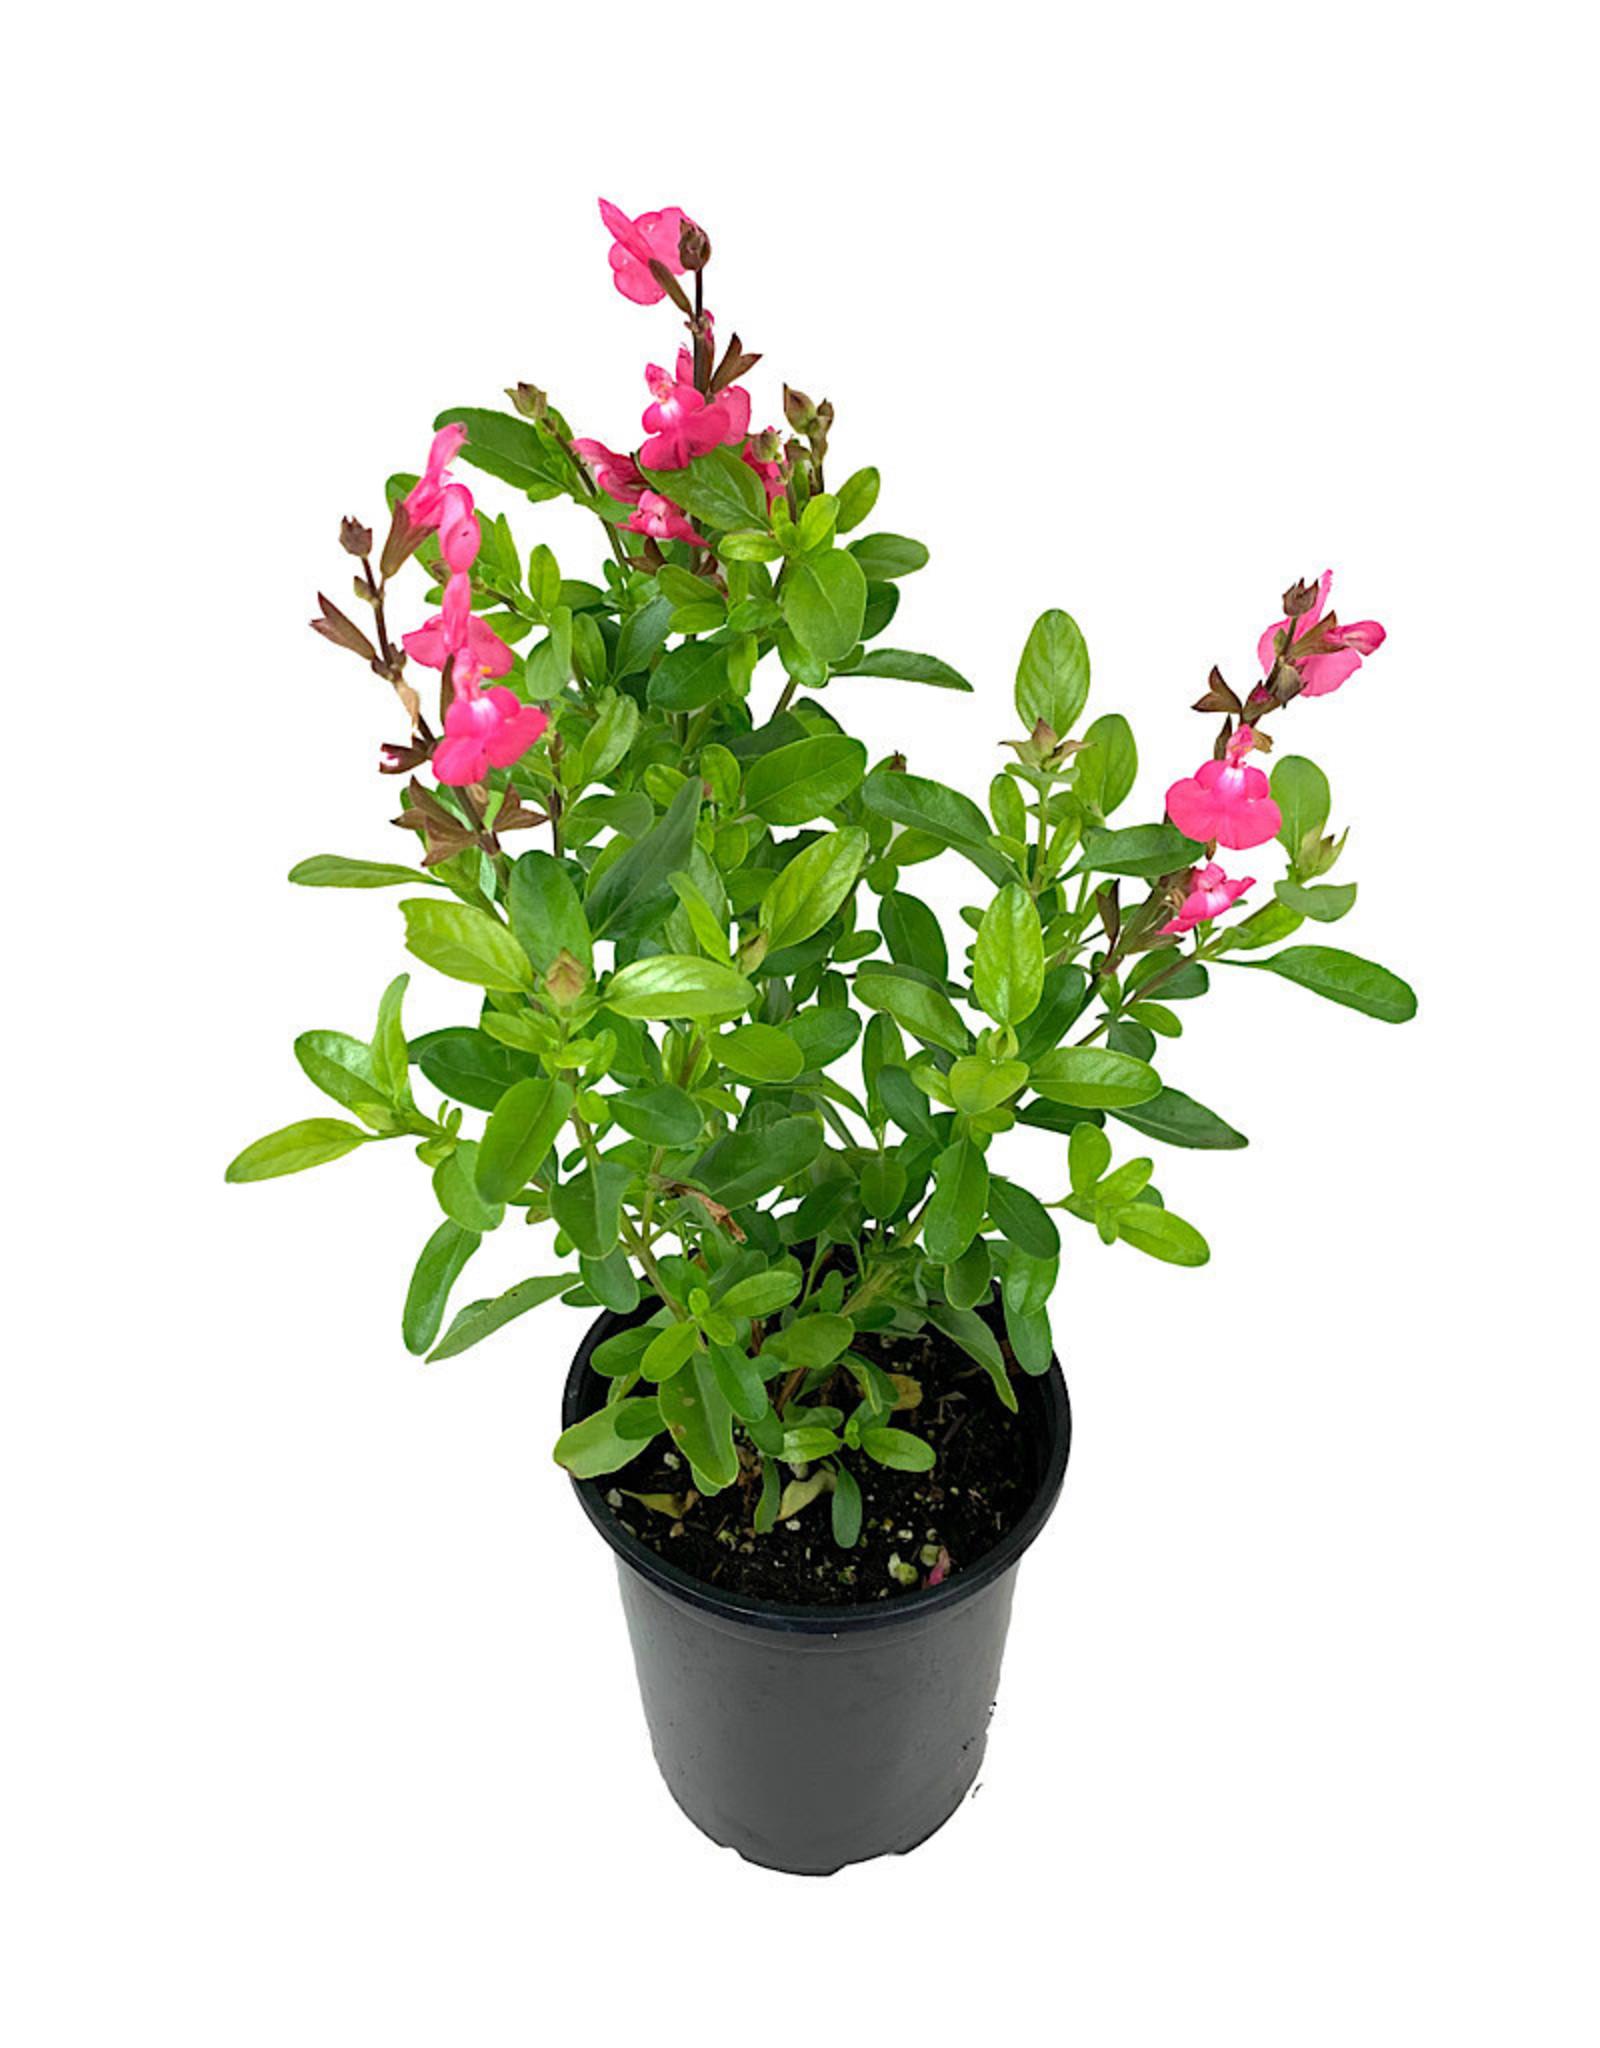 Salvia 'Mirage Pink' Quart